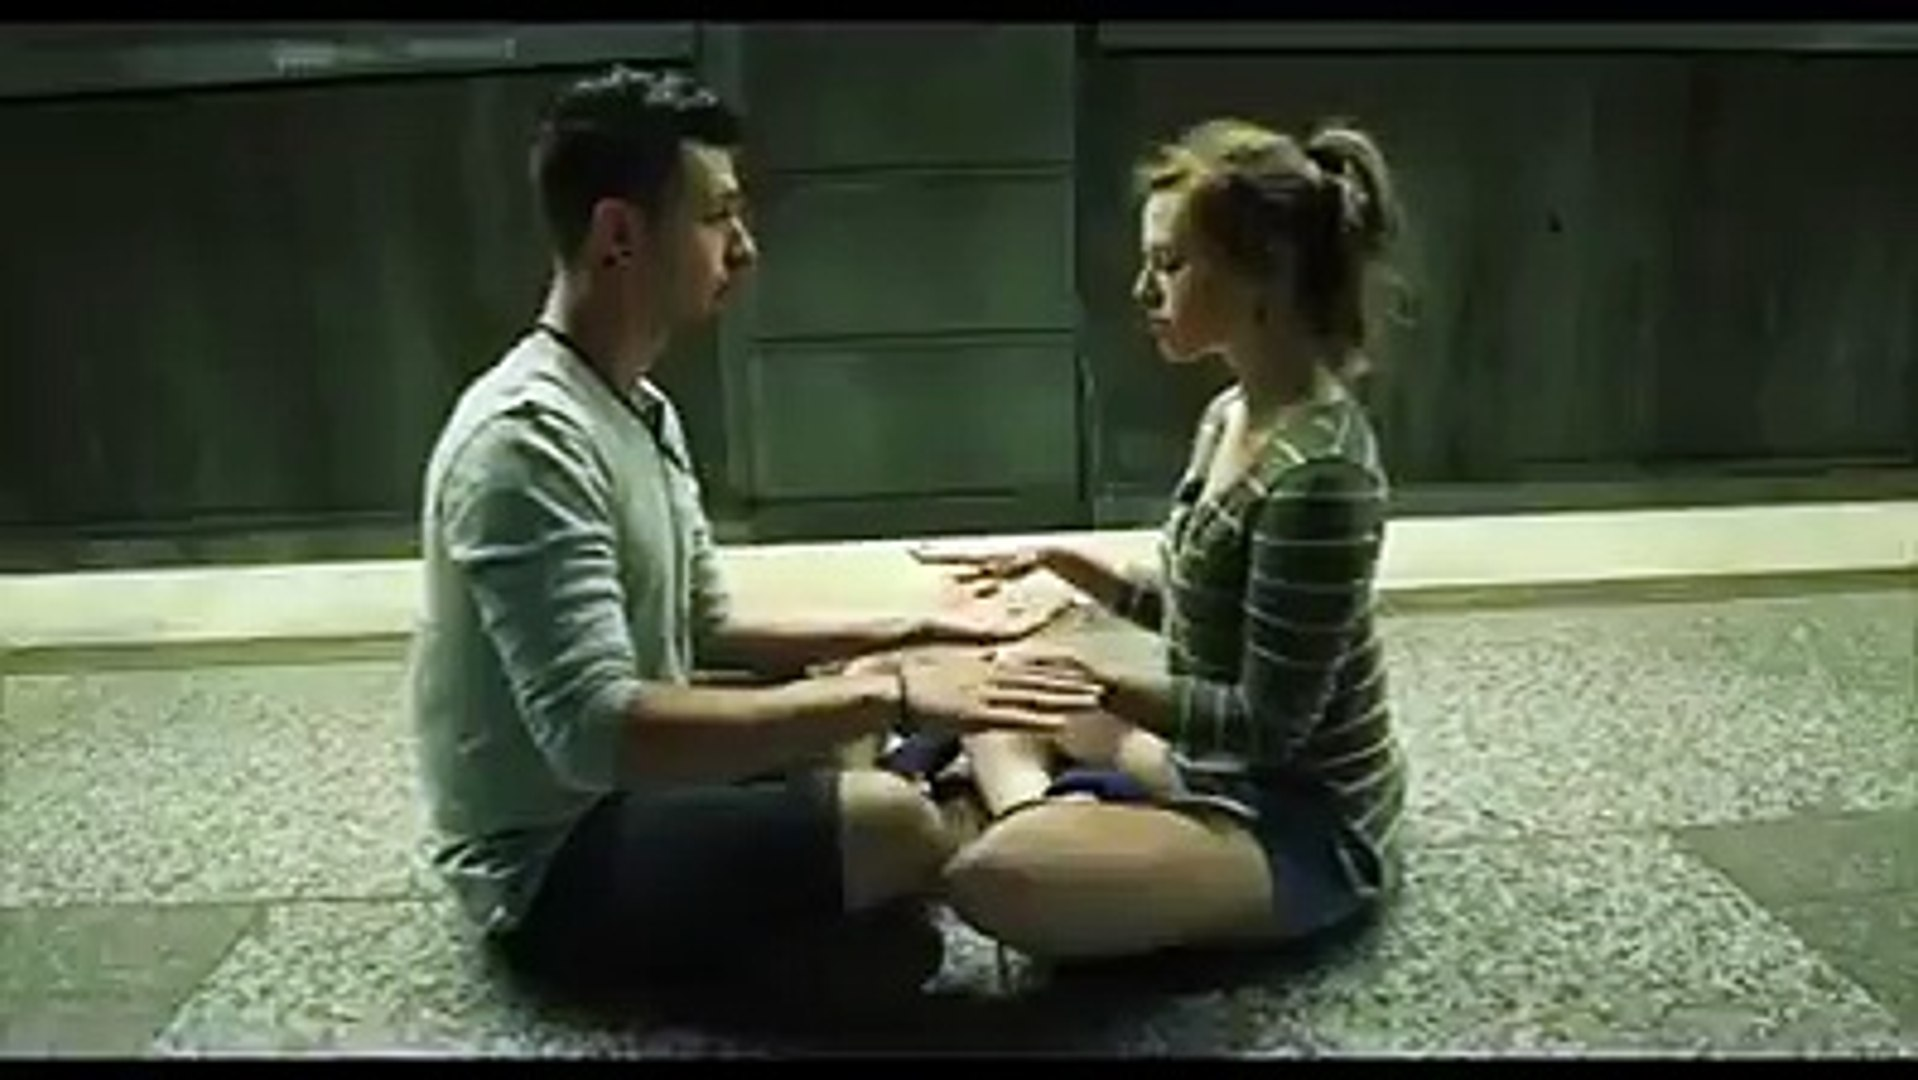 Two guys romantic dance on the railway-station with kissings - desi girls vidoe